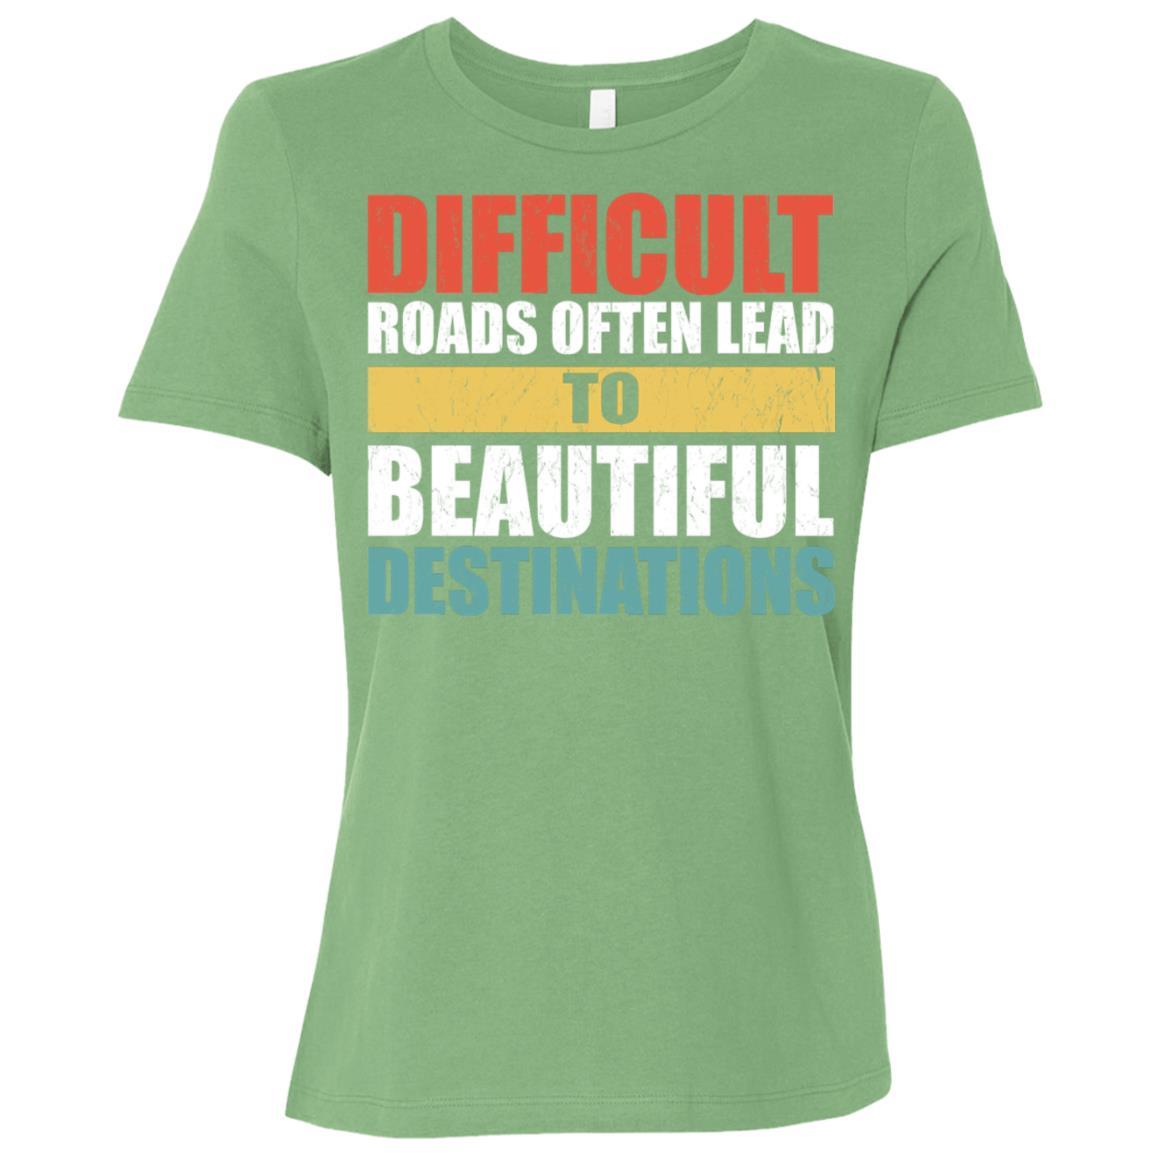 Difficult Roads Often Lead To Beautiful Destinations Women Short Sleeve T-Shirt